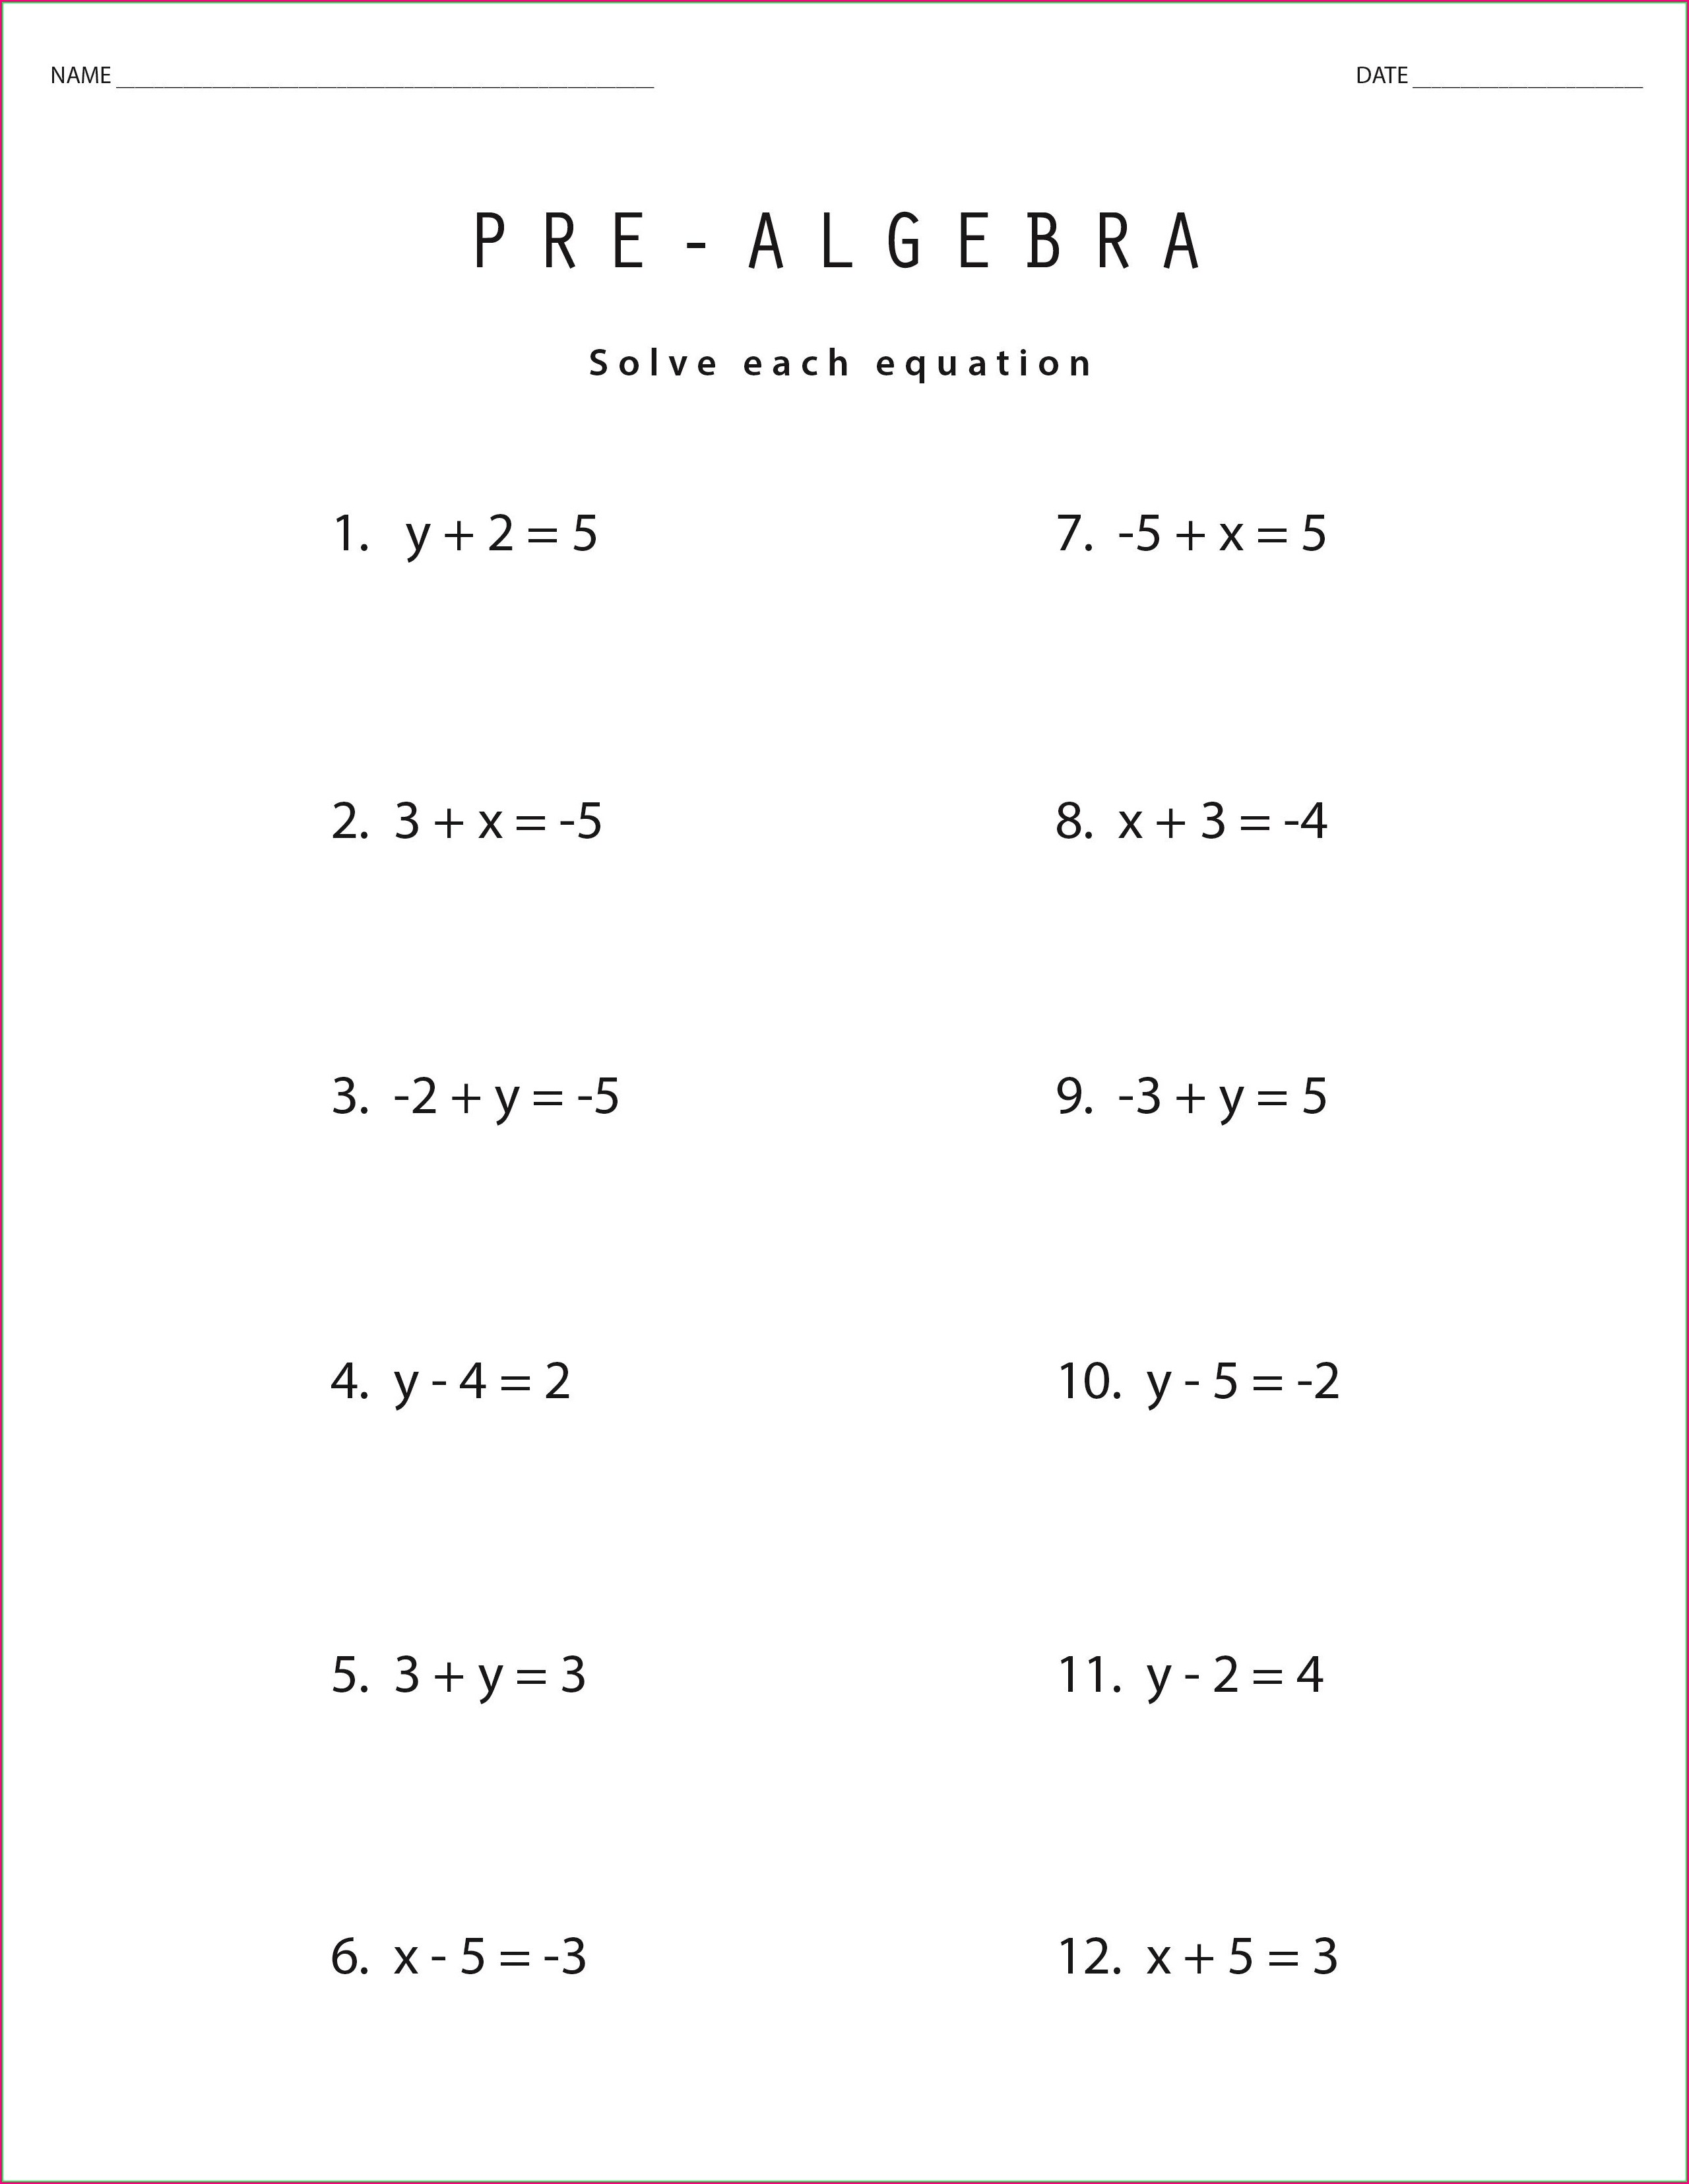 Pre Algebra 9th Grade Math Worksheets